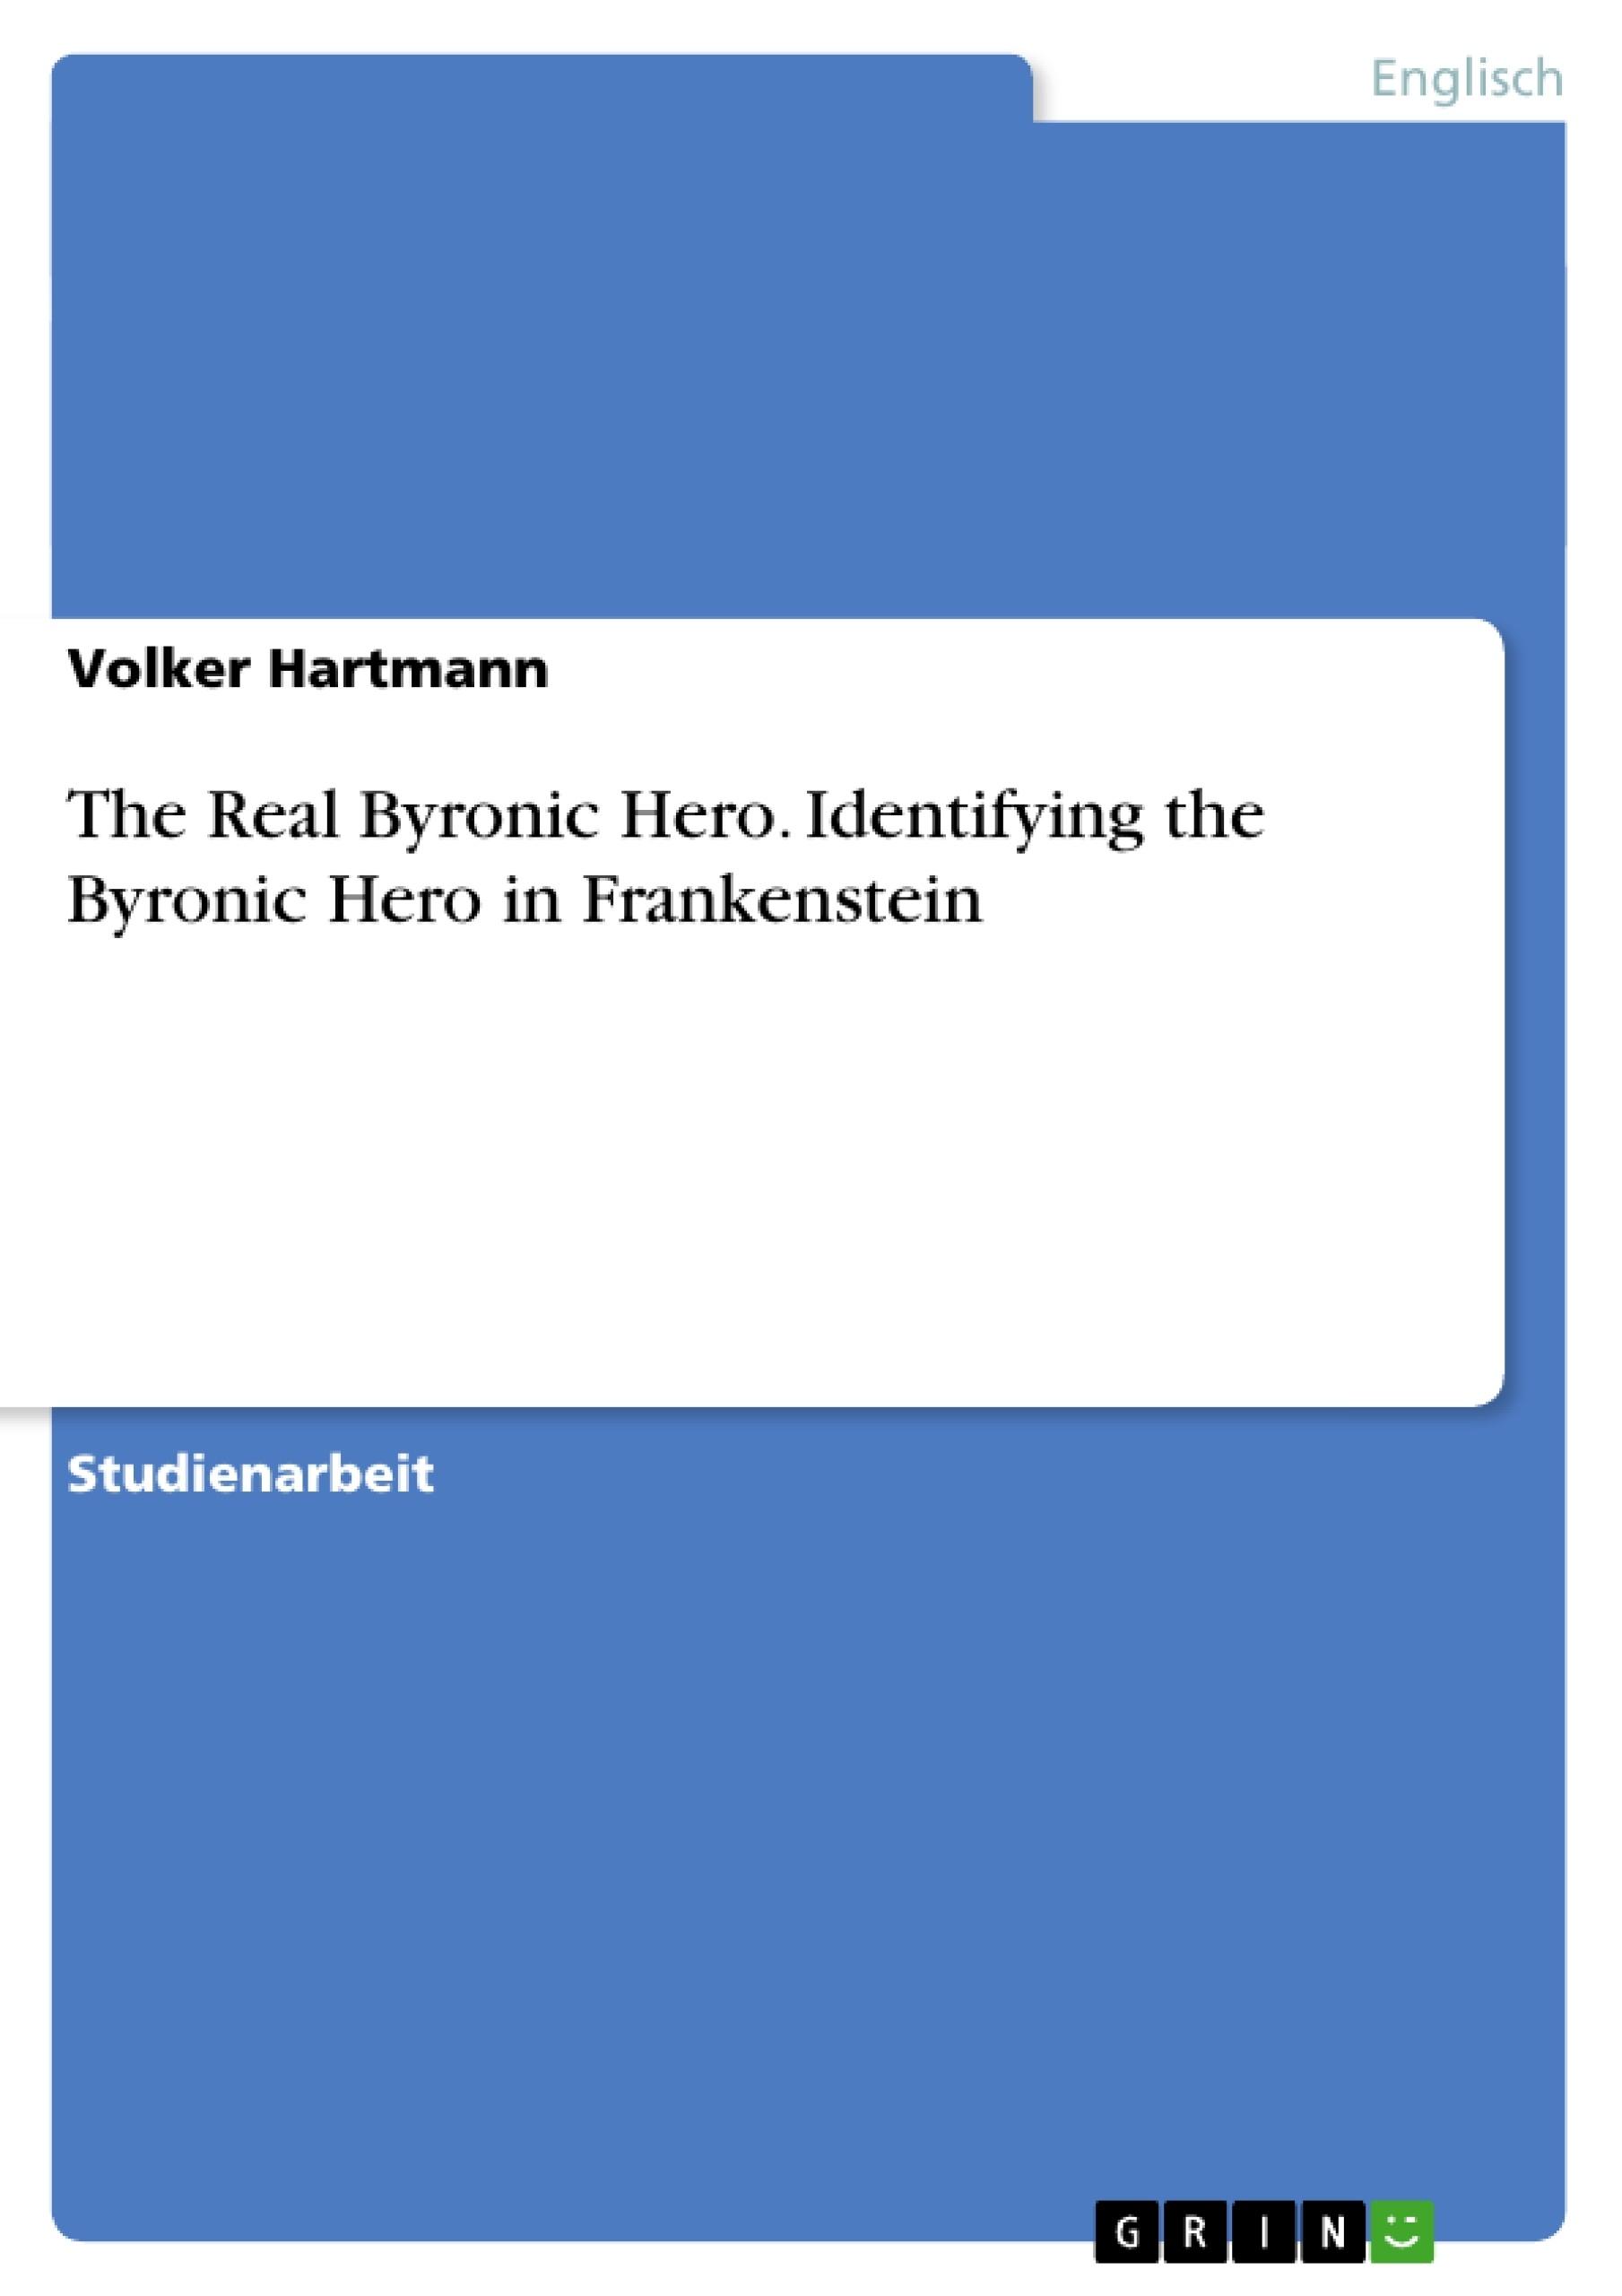 Titel: The Real Byronic Hero. Identifying the Byronic Hero in Frankenstein